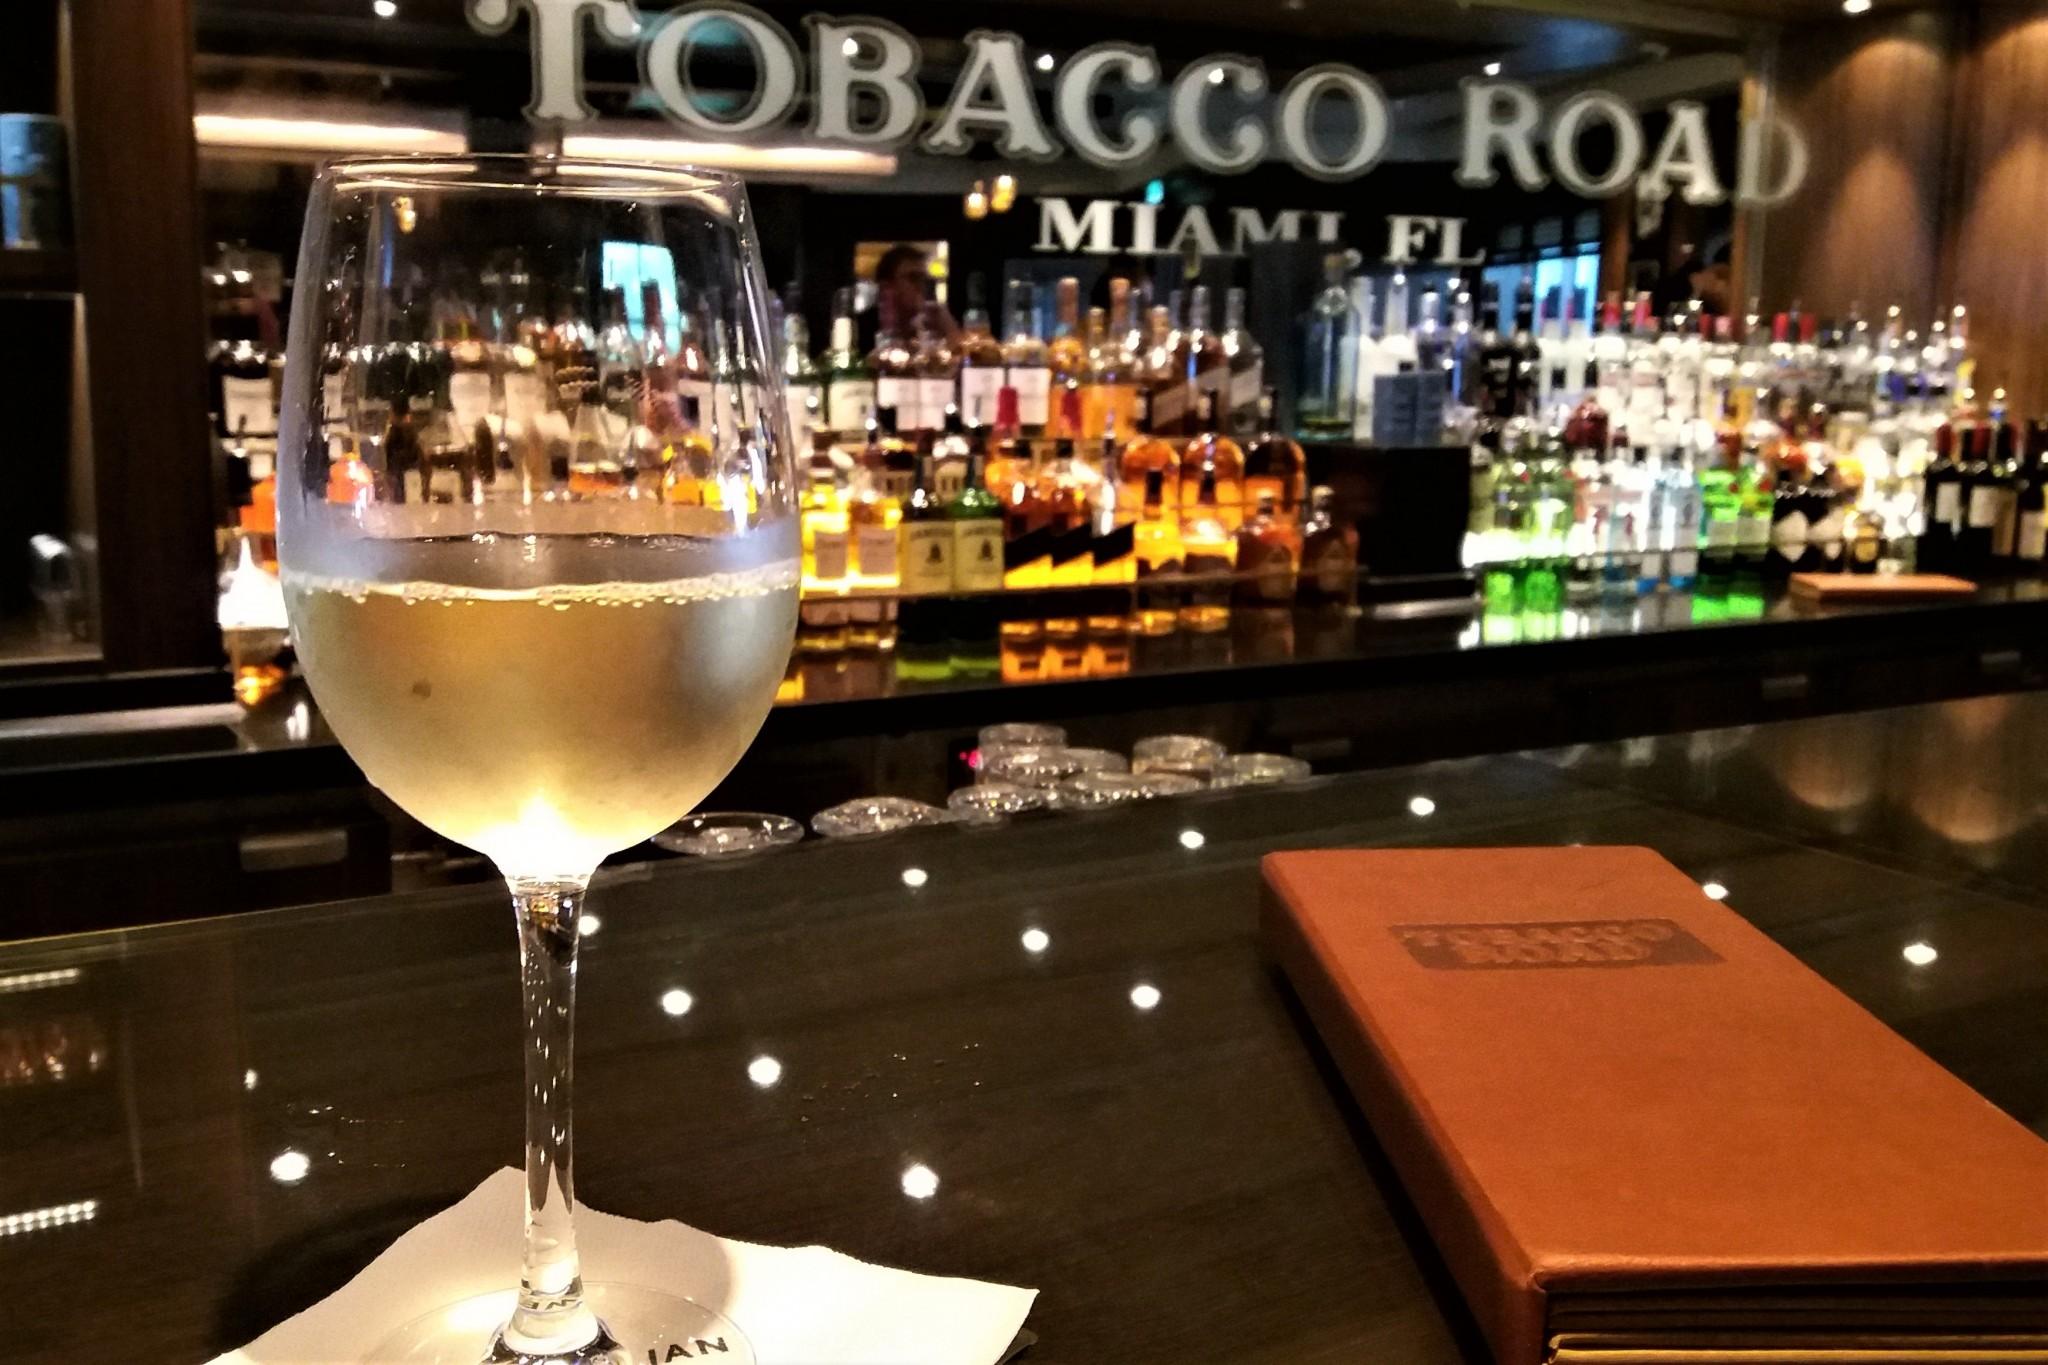 Norwegian Escape Tobacco Road 2